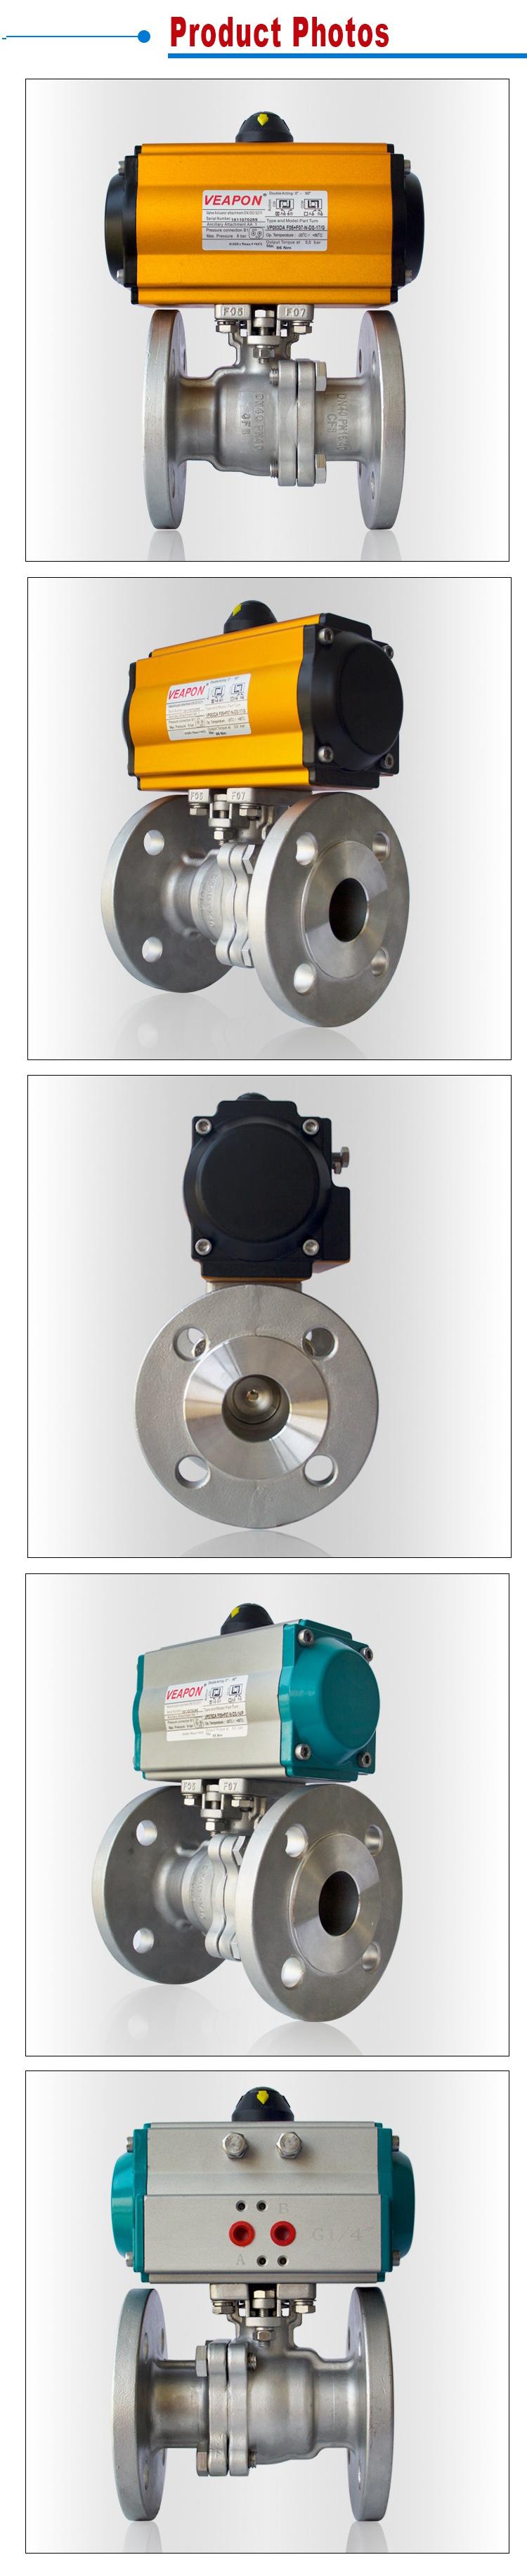 photos of pneumatic flanged ball valve.jpg